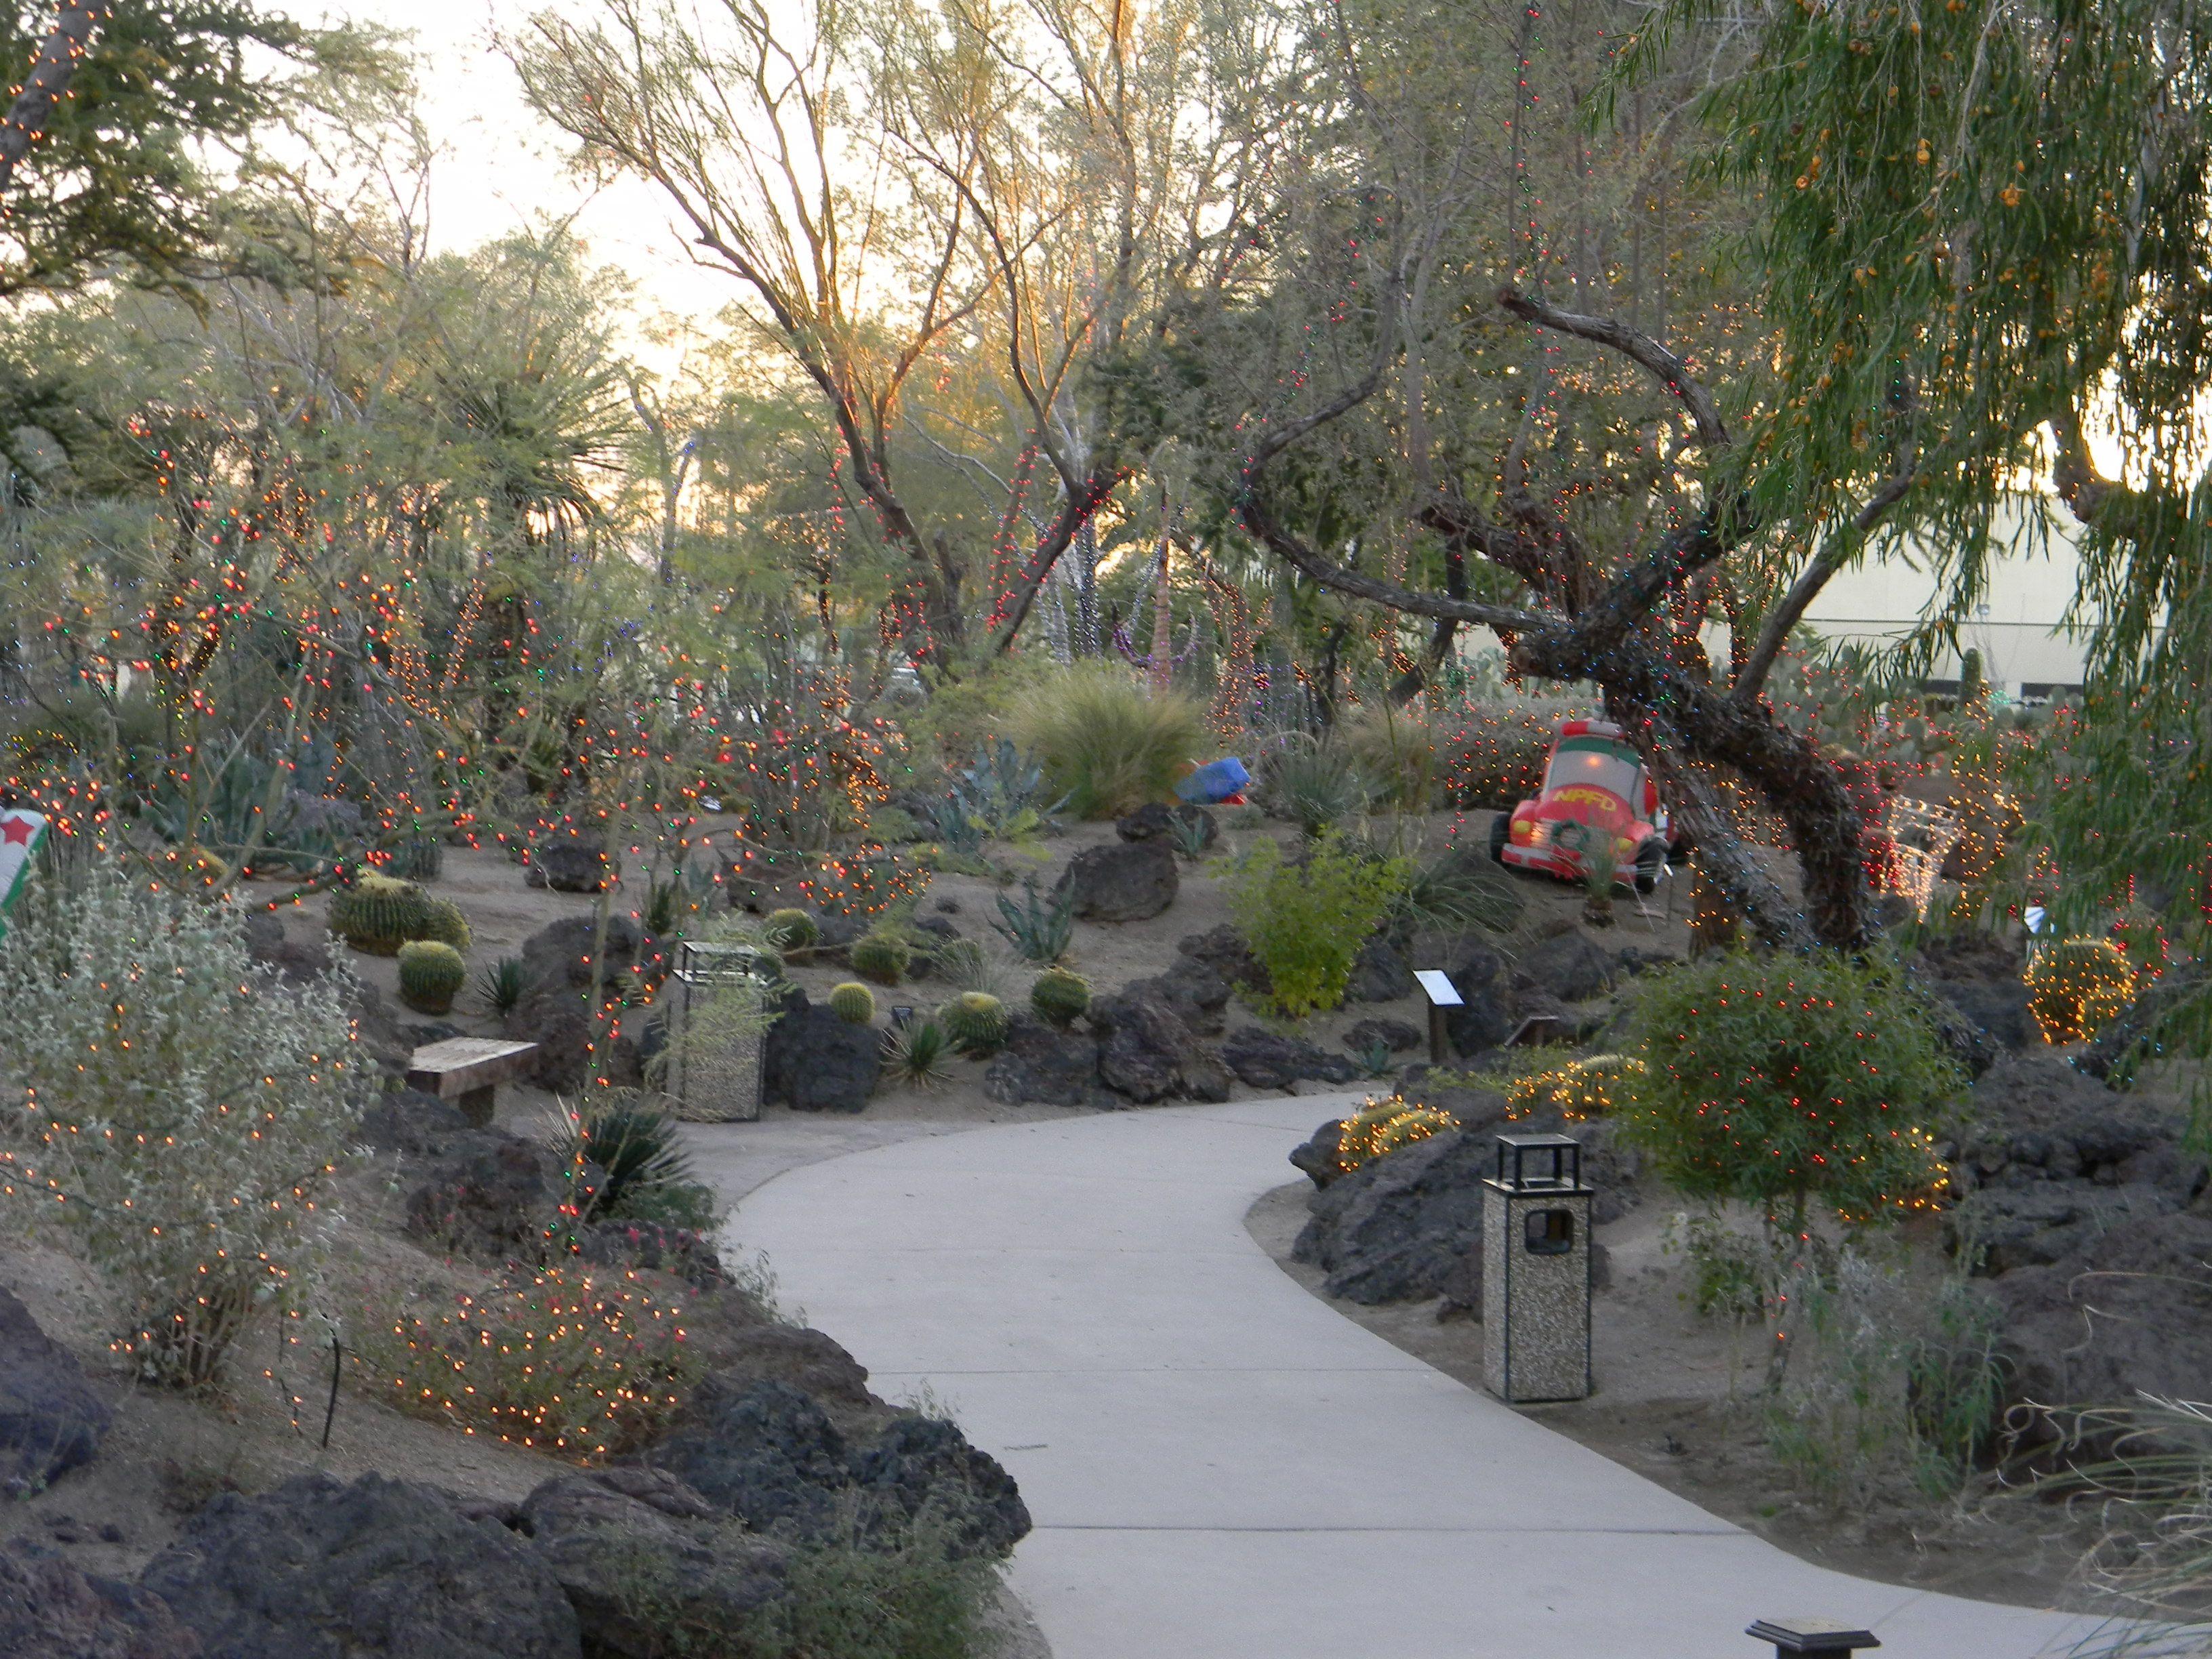 24ae92d3f3f63d73d118480804cc7a16 - Botanical Cactus Gardens Las Vegas Nv